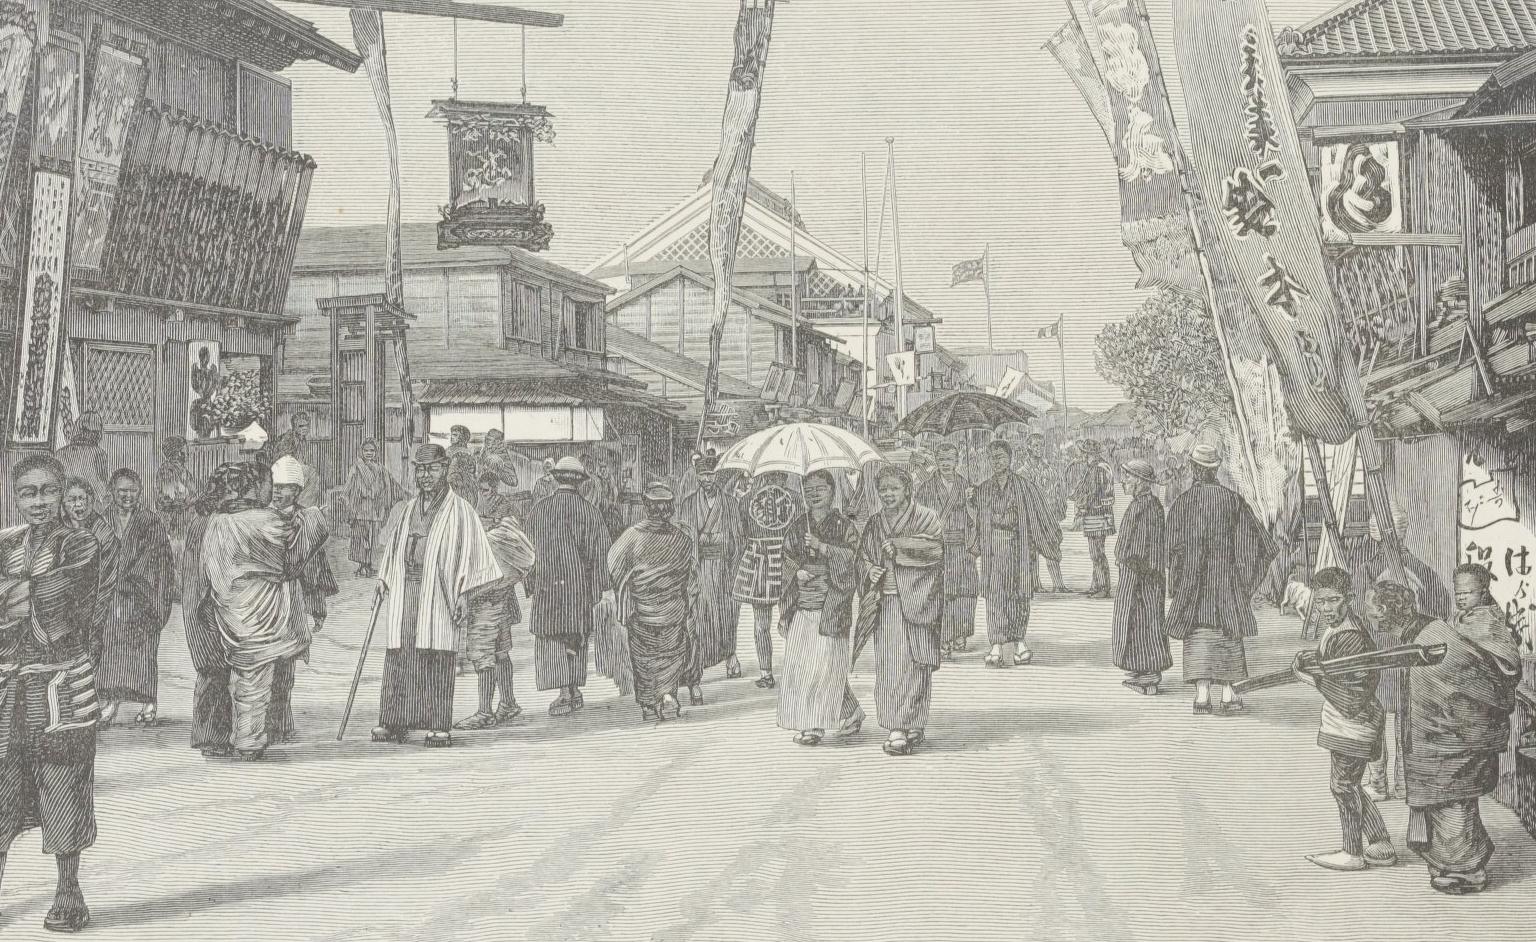 Eggermont, Isidore. Voyage autour du globe, 1892-1900. FOL-G-123 (2). p. 17.